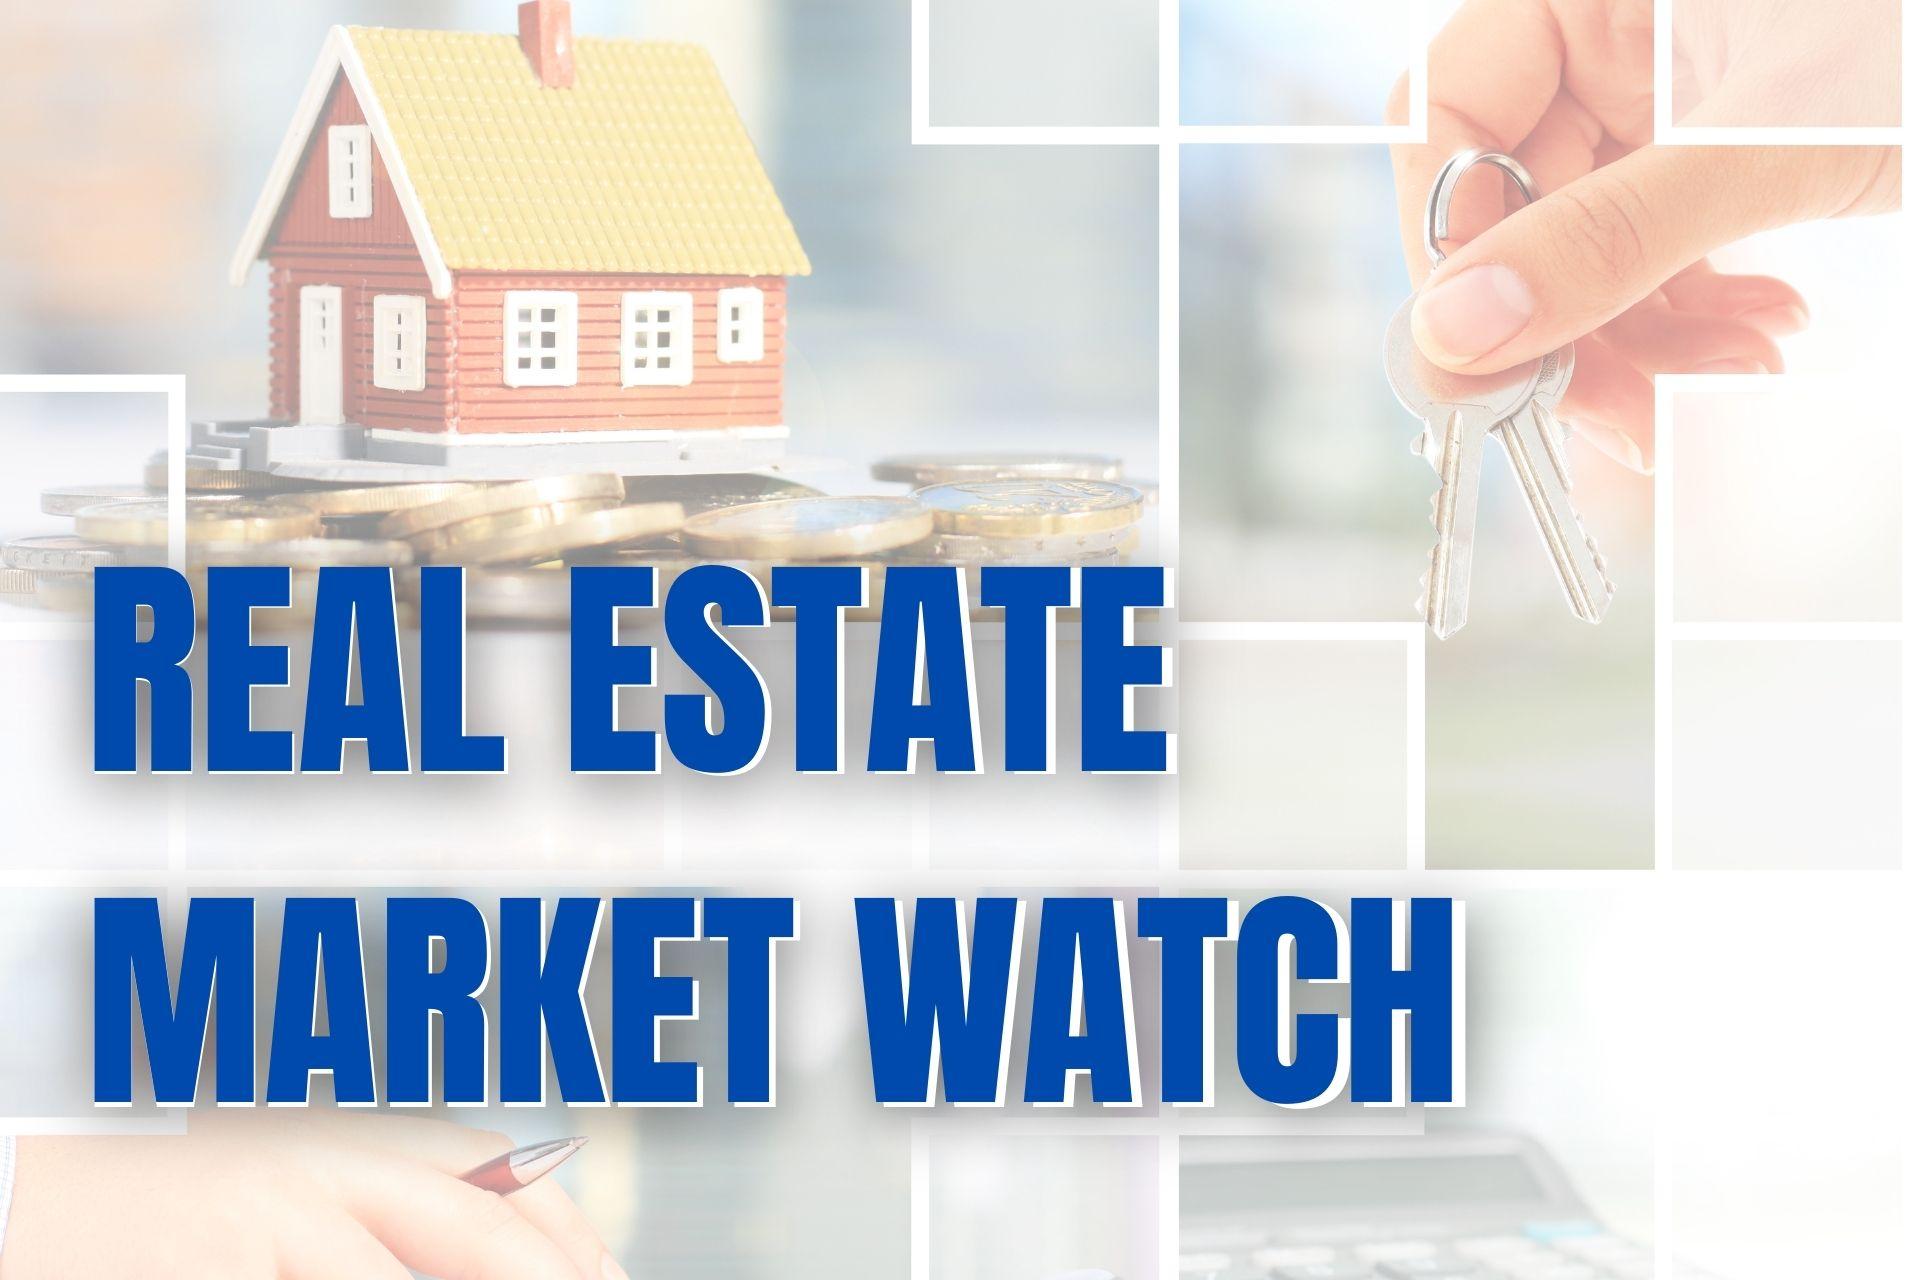 Real Estate Market Watch